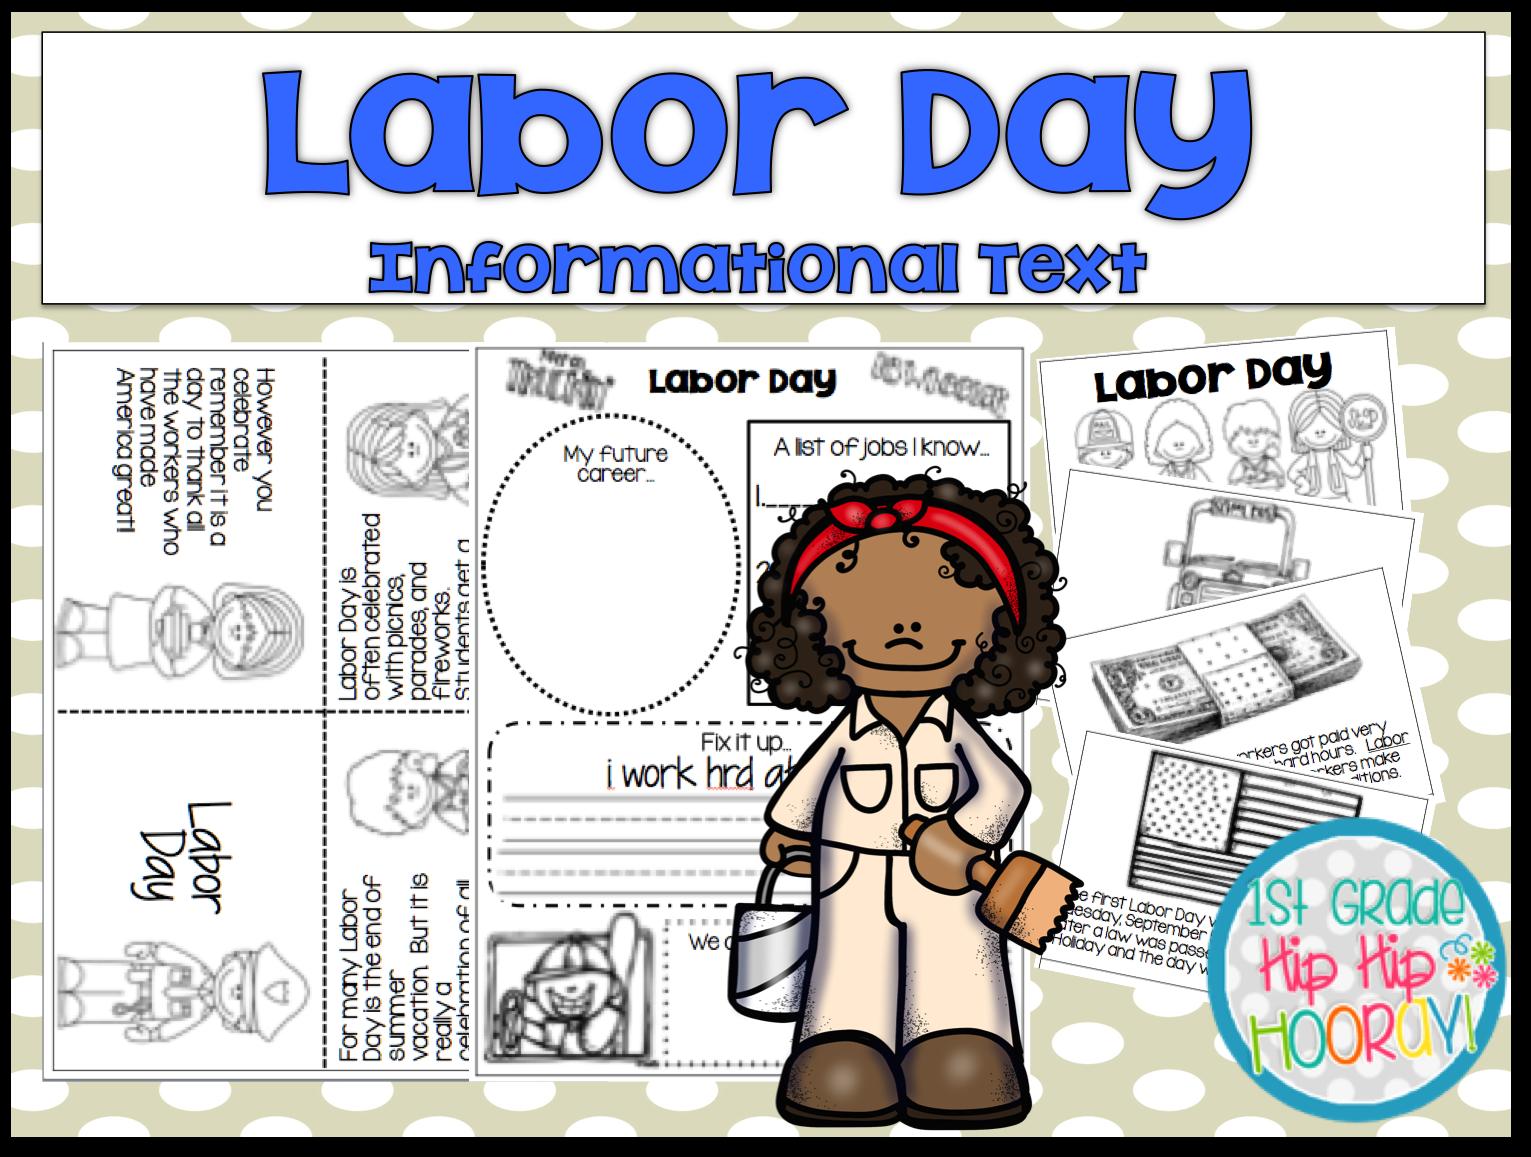 1st Grade Hip Hip Hooray Labor Day